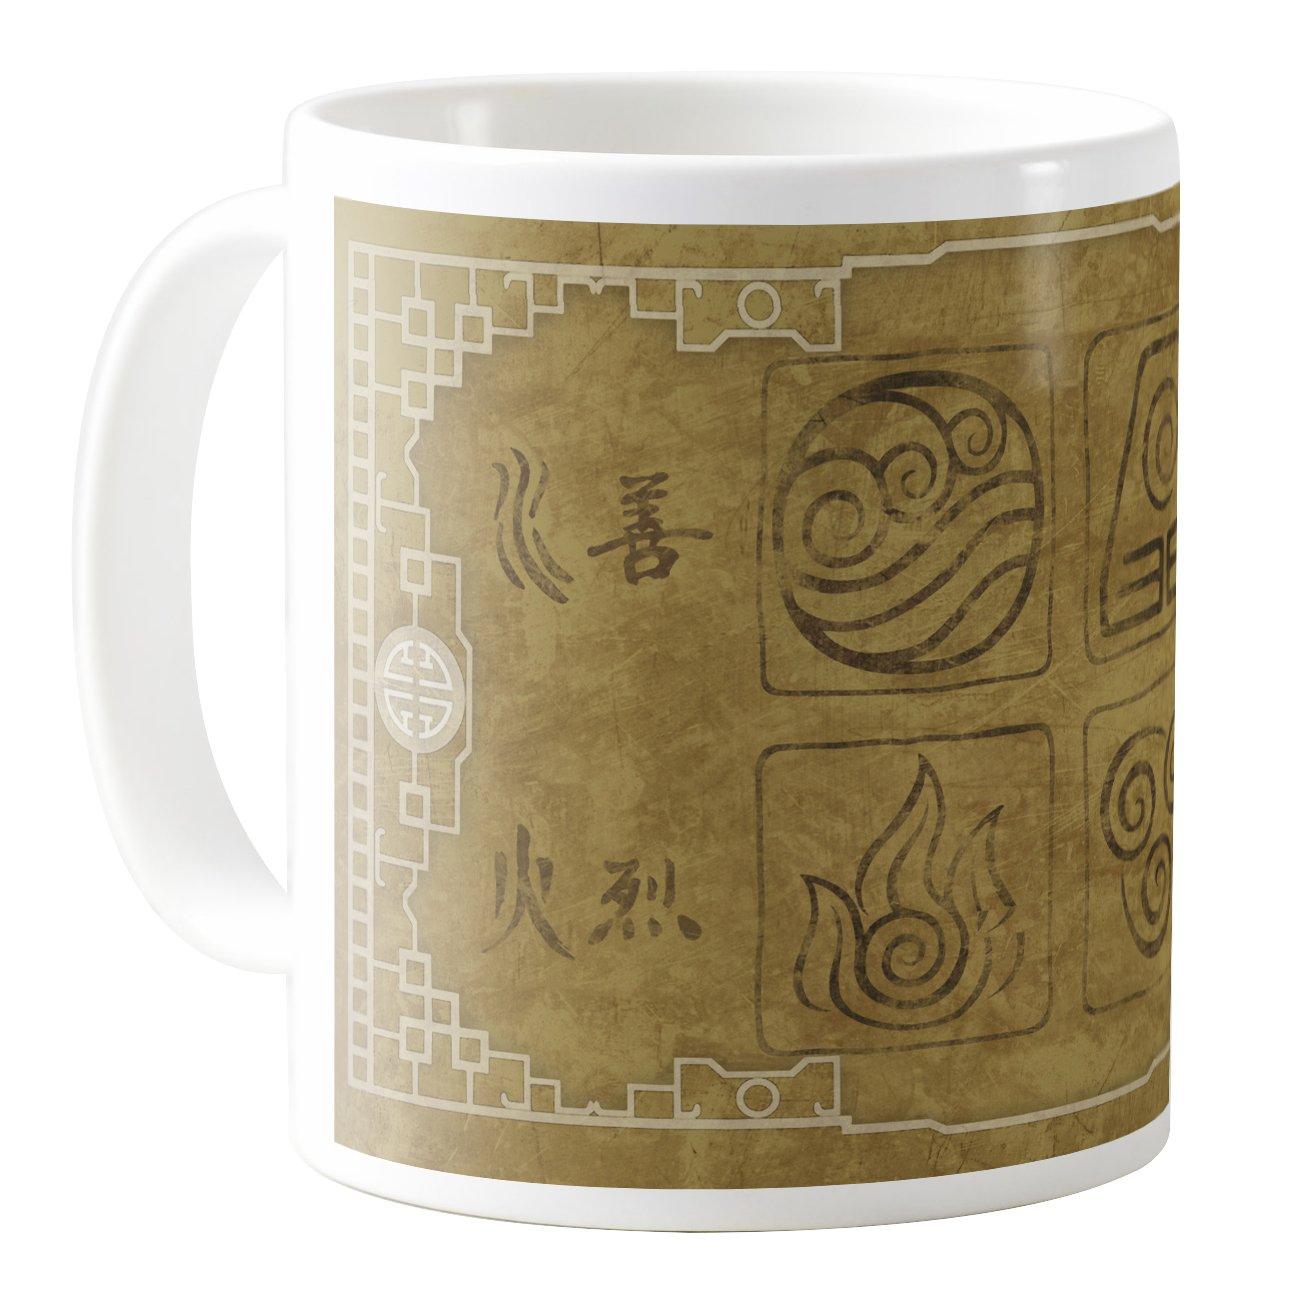 aquacafemug – cmstl-a79462 – 11オンスセラミックコーヒーマグティーカップ B074L9NMTW